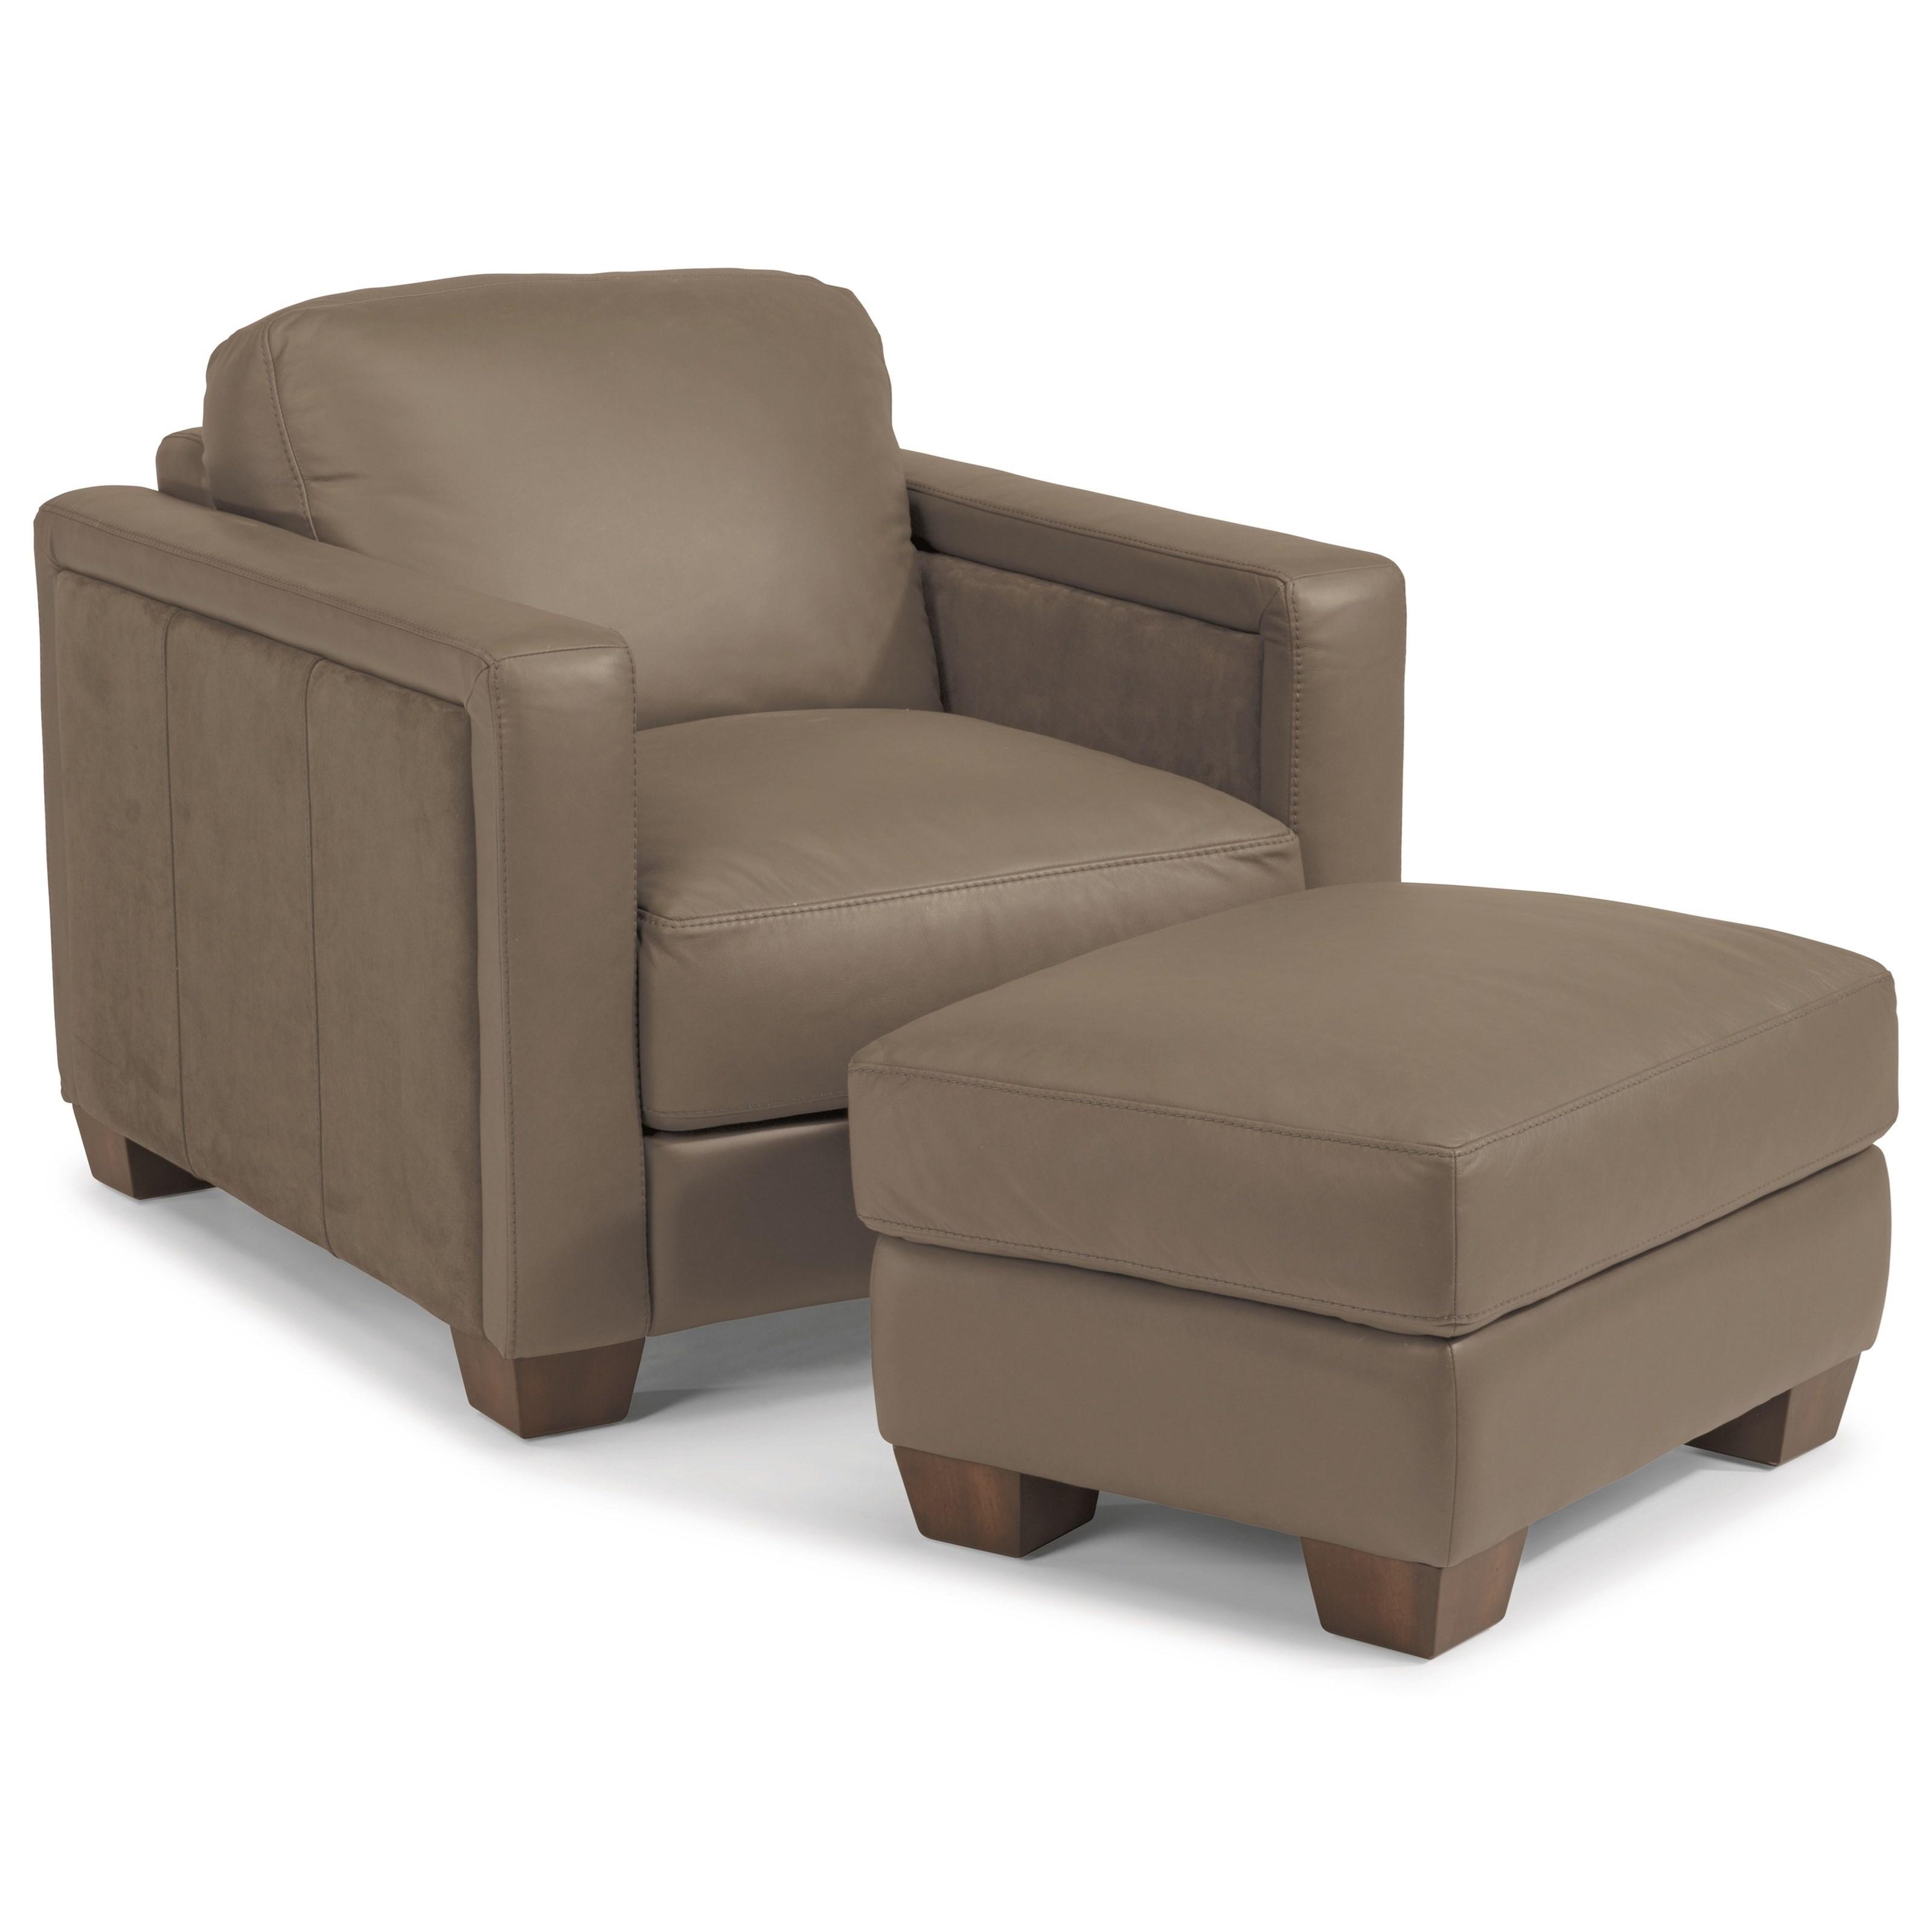 flexsteel sofa sets semi circular latitudes wyman contemporary chair and ottoman